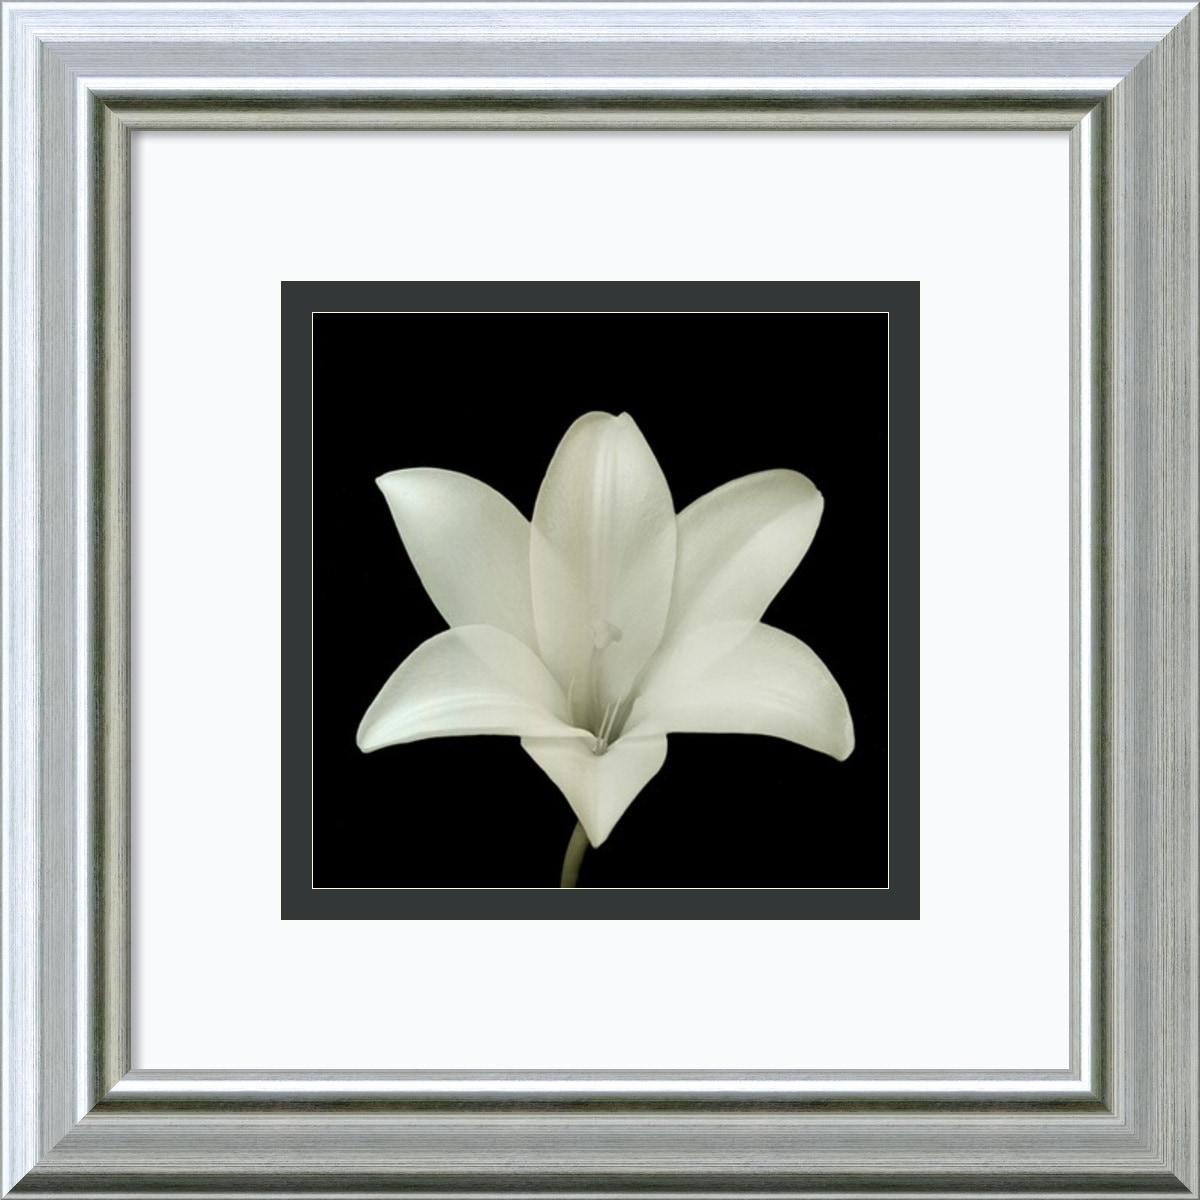 Amanti Art - Walter Gritsik 'Flower Series VII' Framed Art Print 12 x 12-inch 150529721